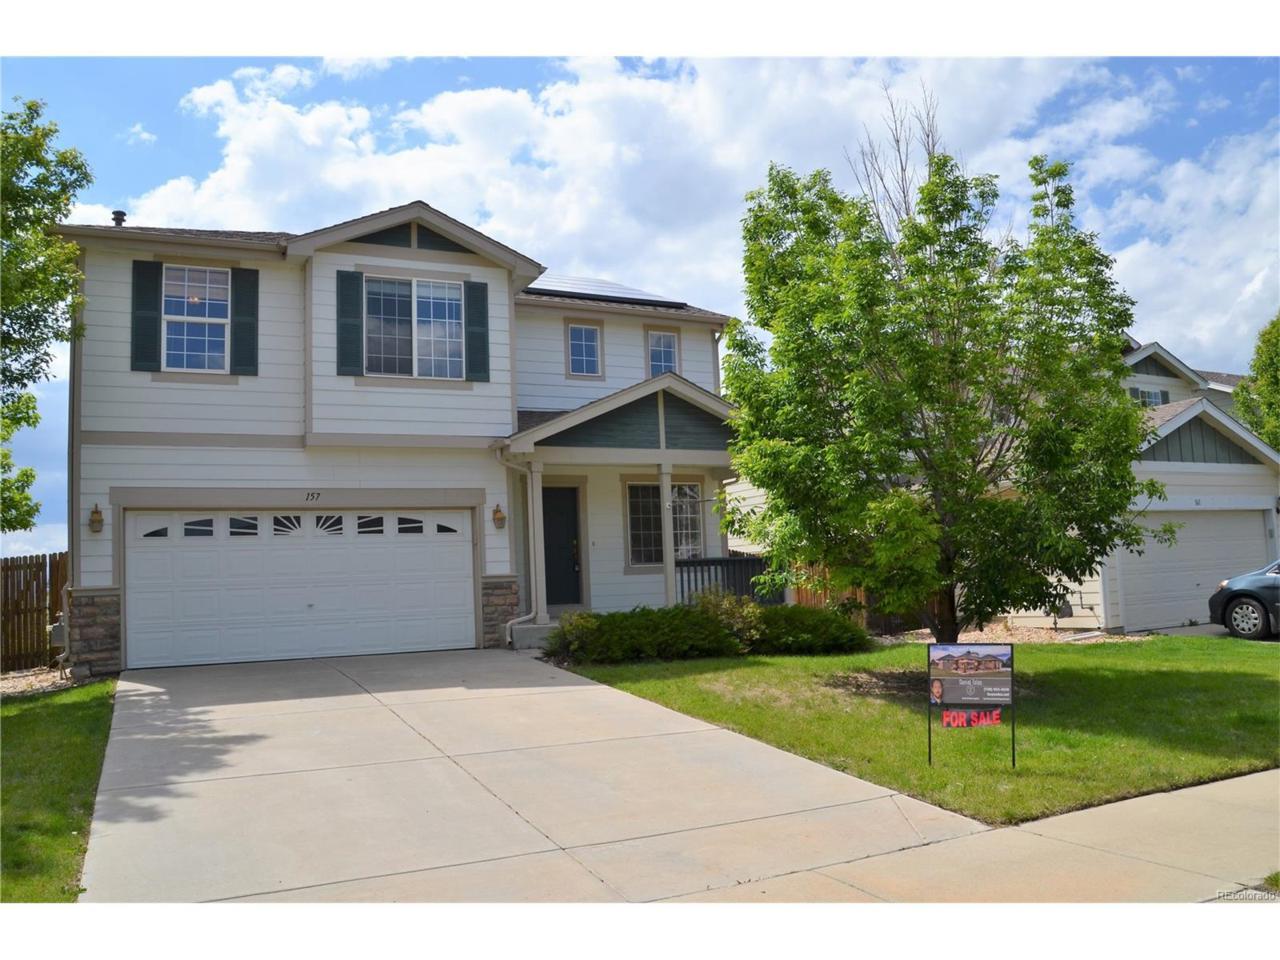 157 Mcafee Circle, Erie, CO 80516 (MLS #6024240) :: 8z Real Estate